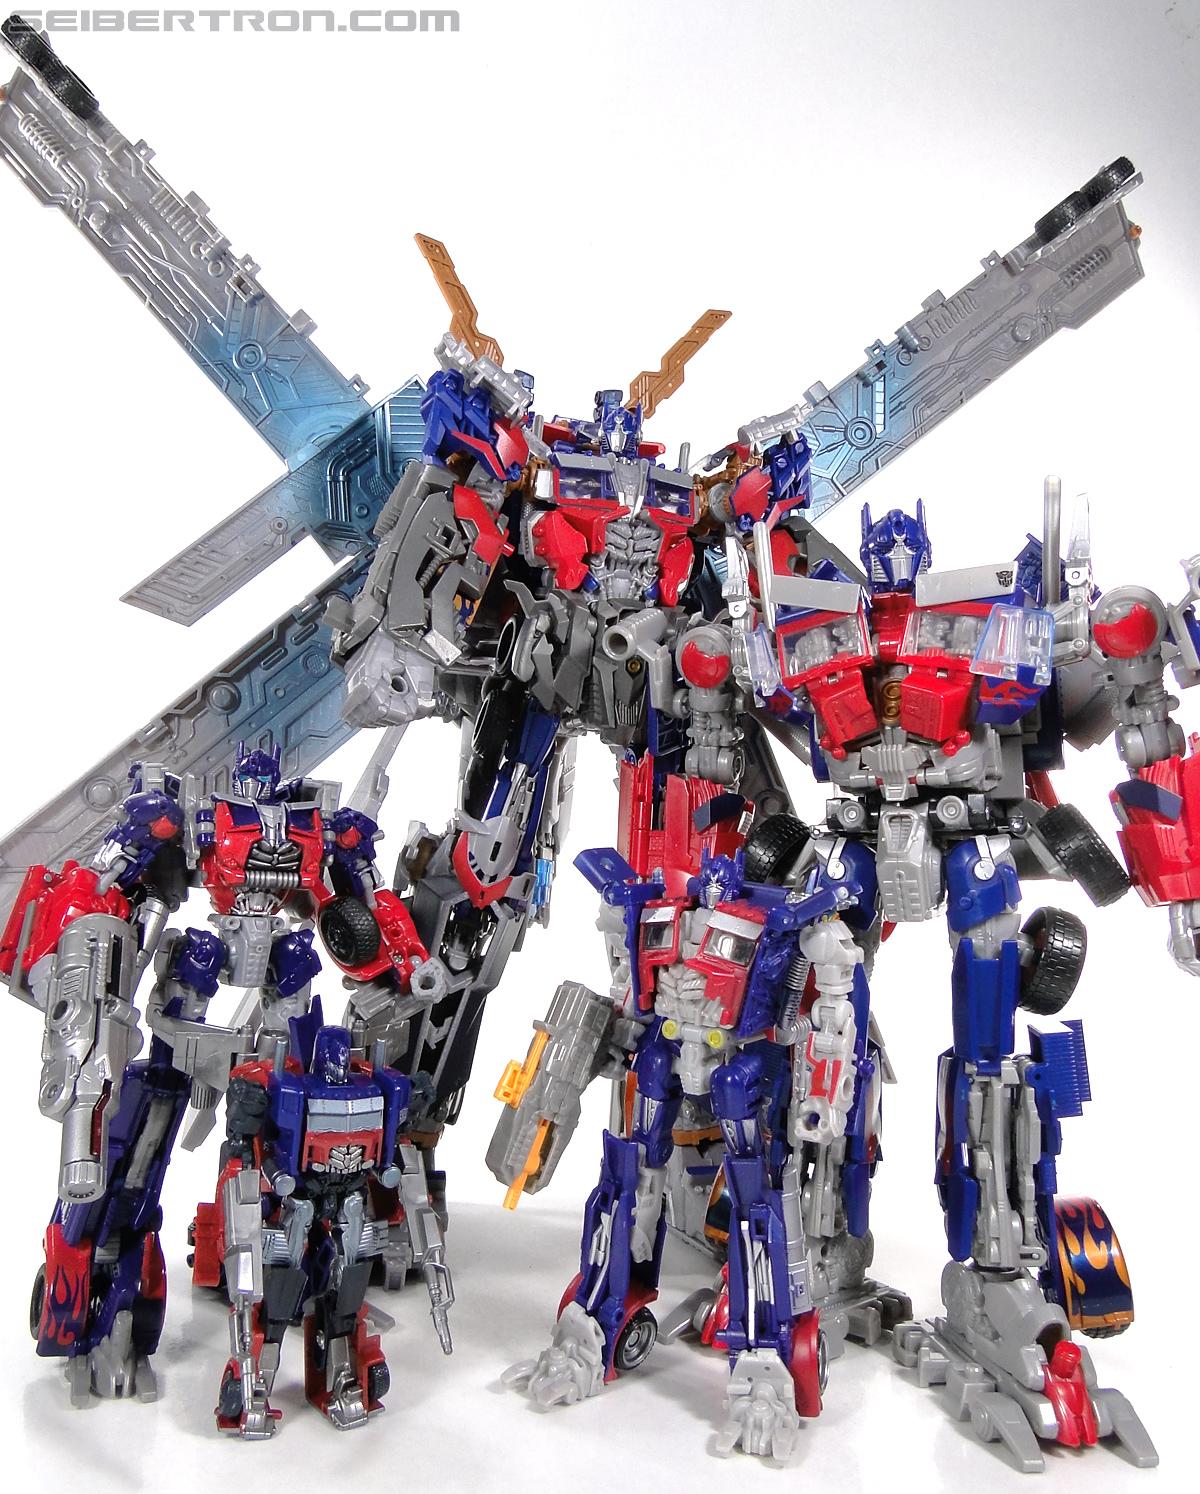 Transformers Dark of the Moon Optimus Prime (Image #143 of 145)